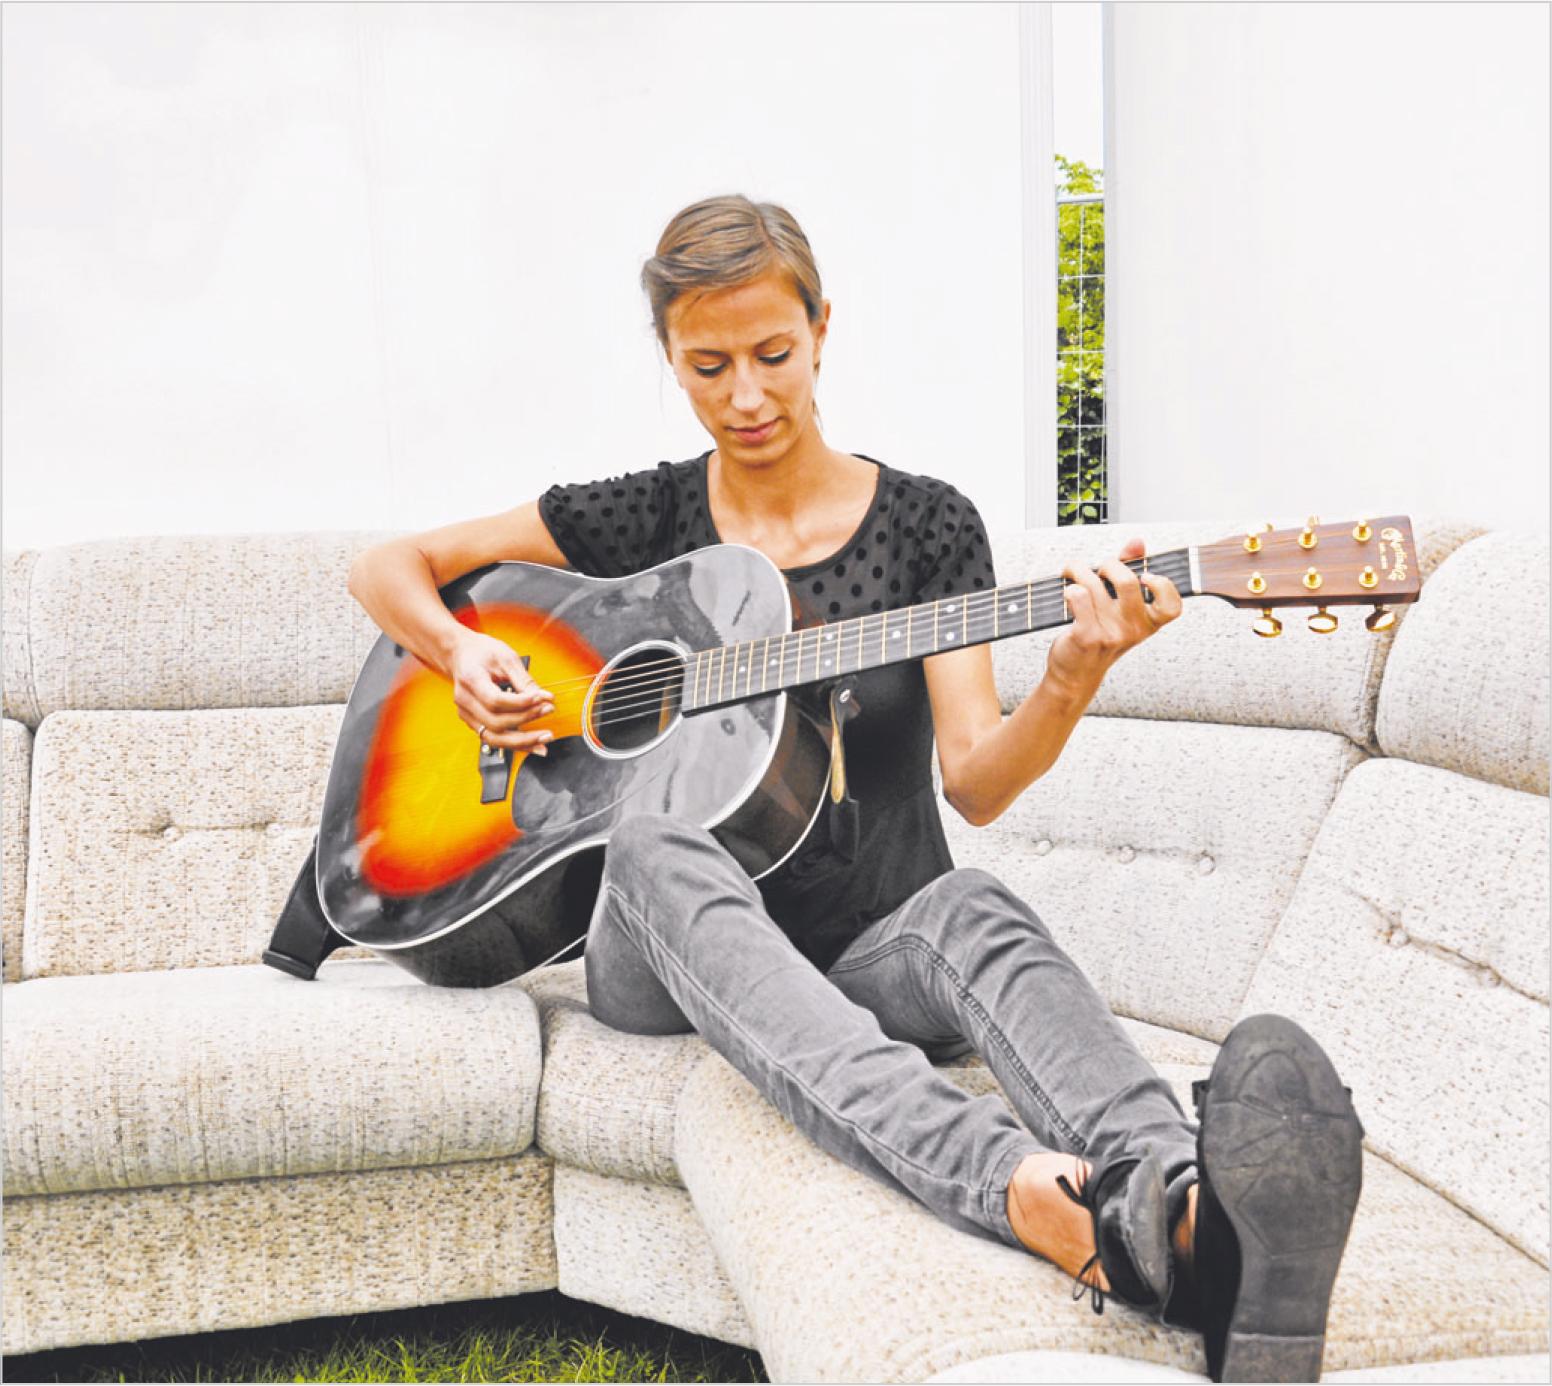 Mathildes første gang som musiker på Kløften